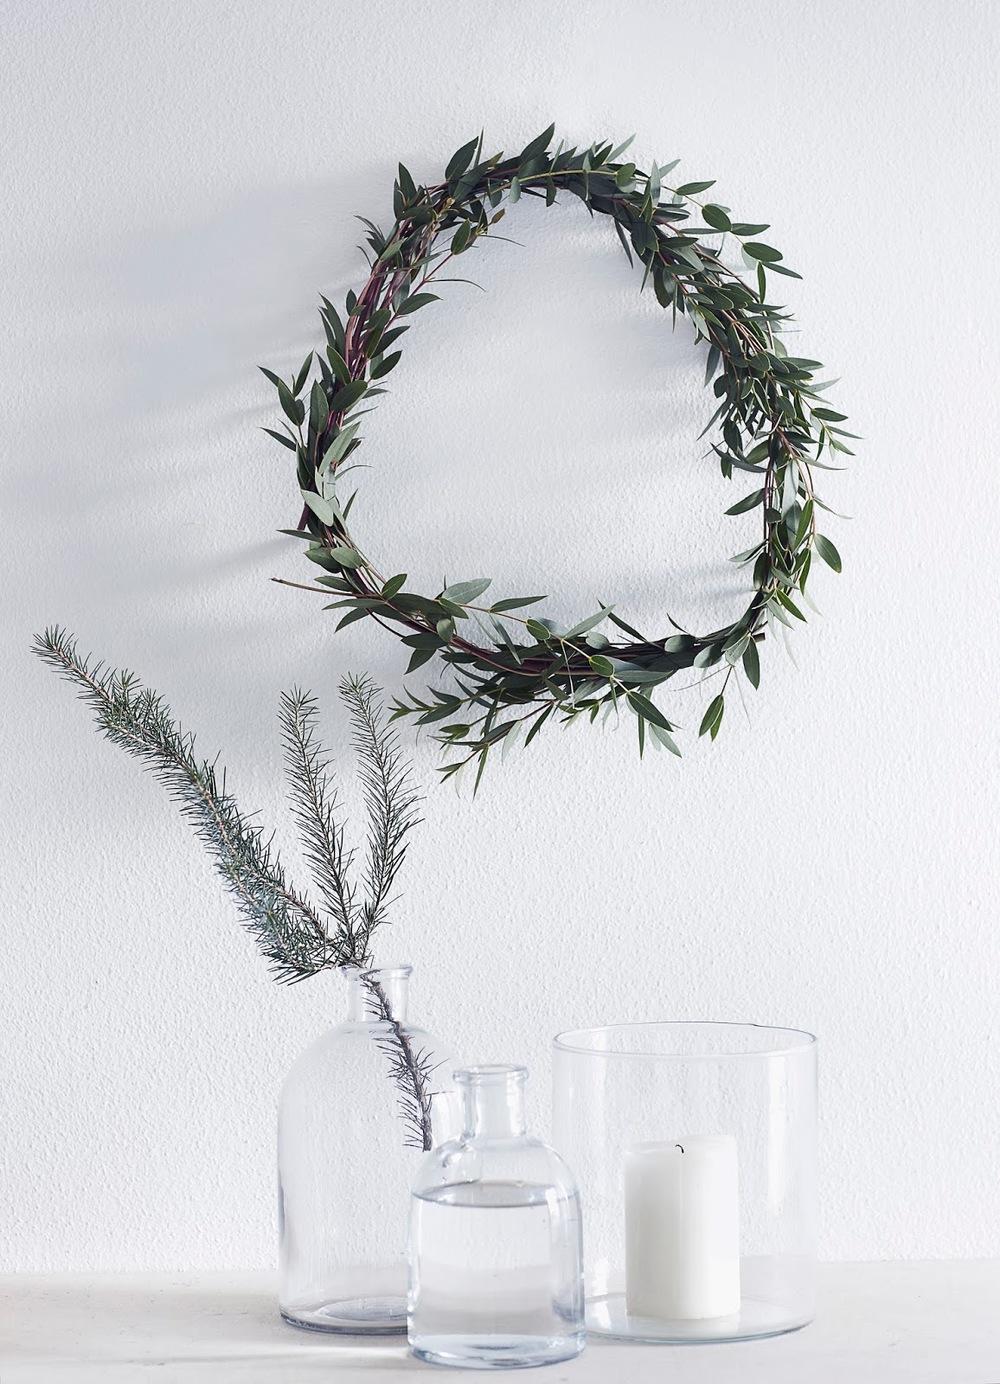 weekdaycarnival_christmas decoration 22.jpg